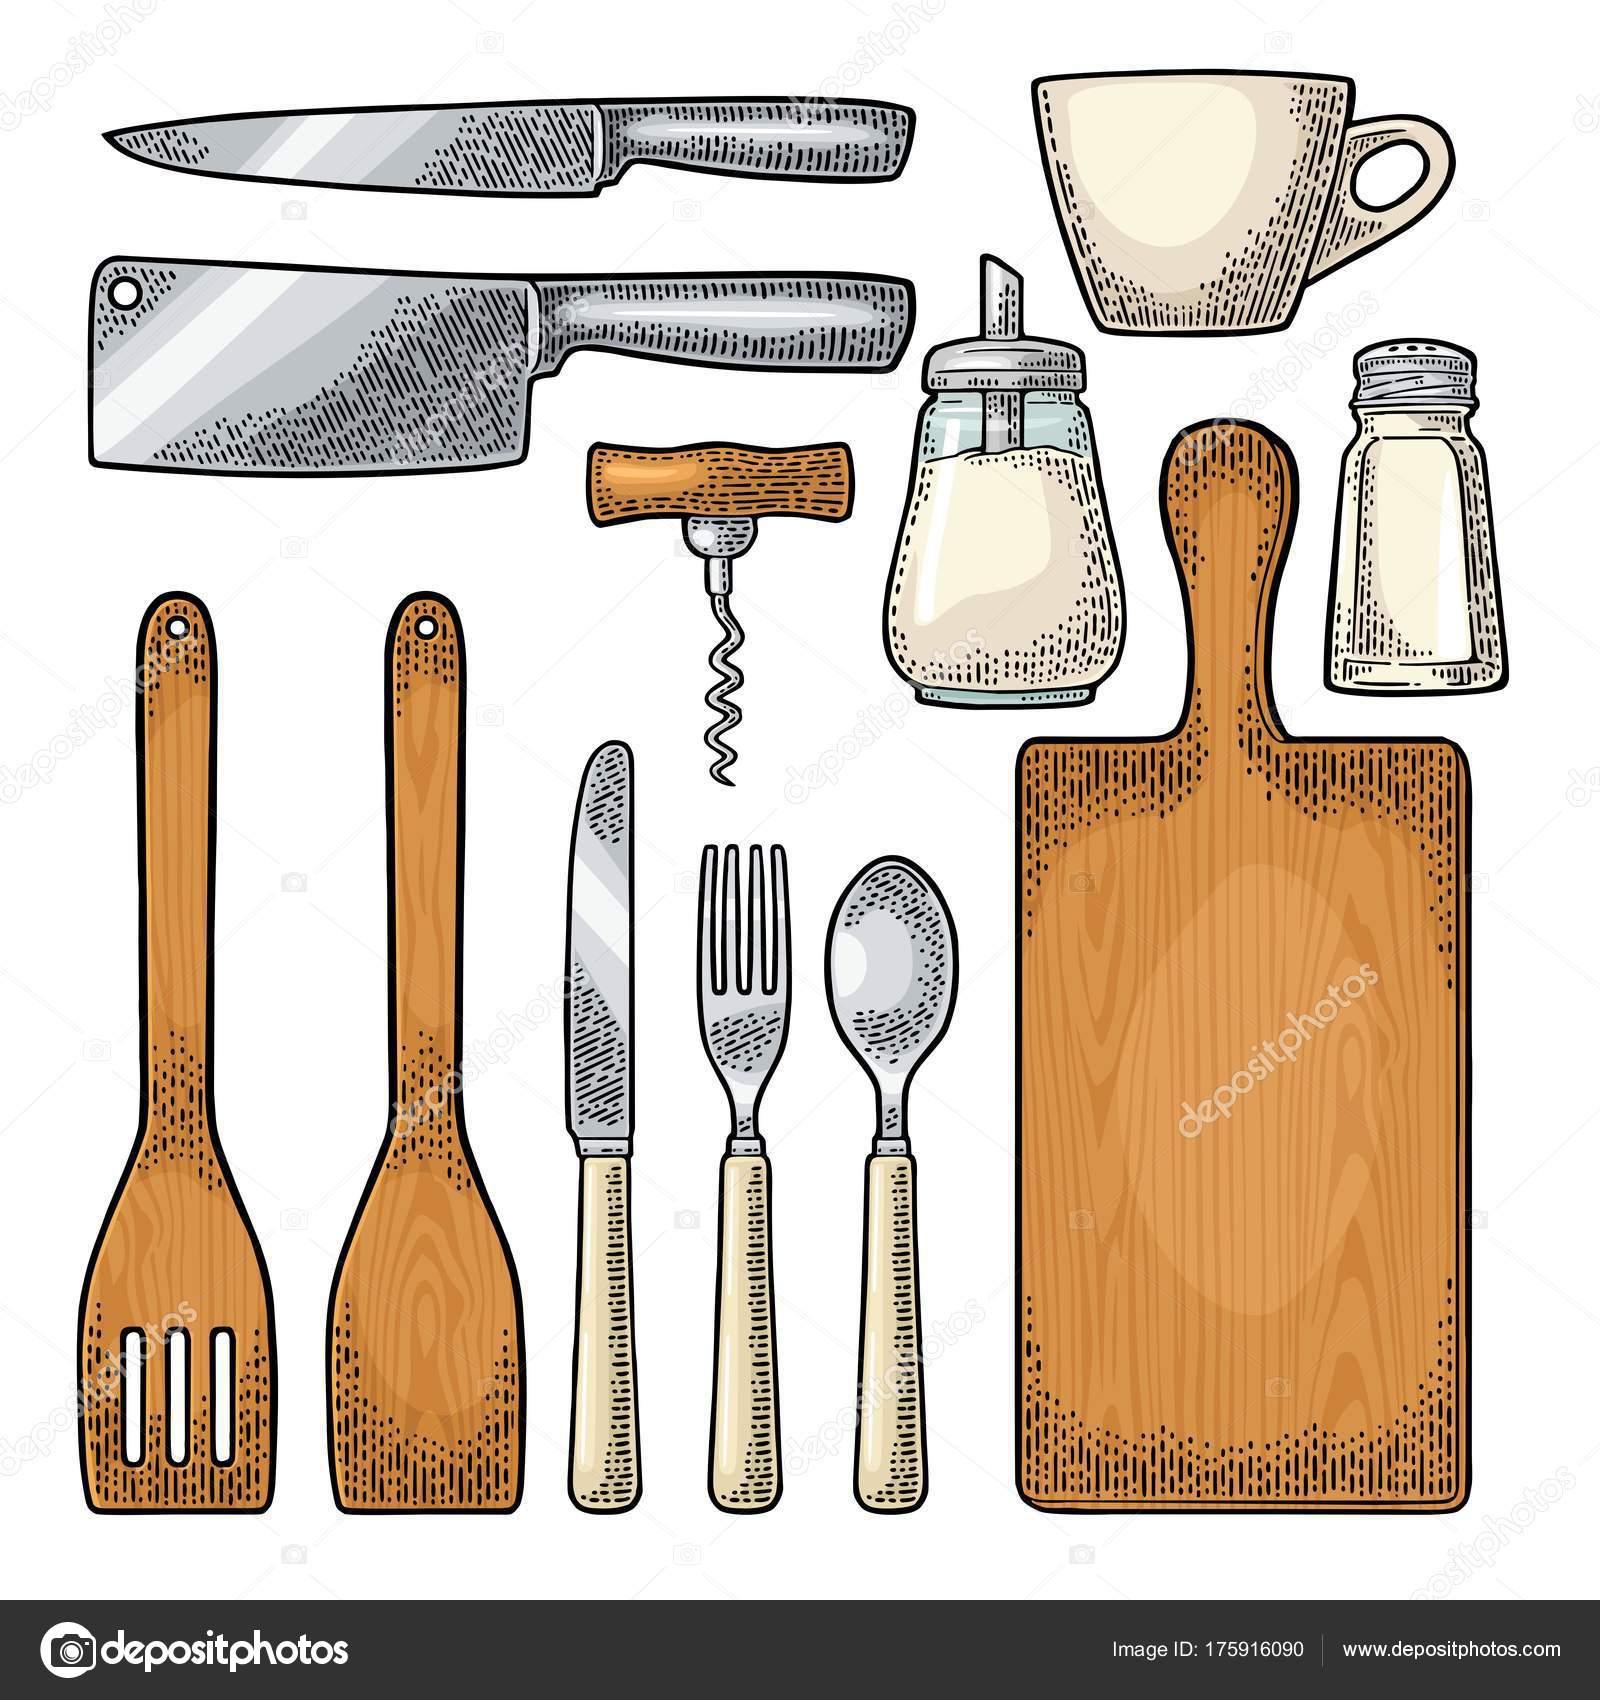 Legen Sie Küchenutensilien. Vektor-Vintage-Gravur